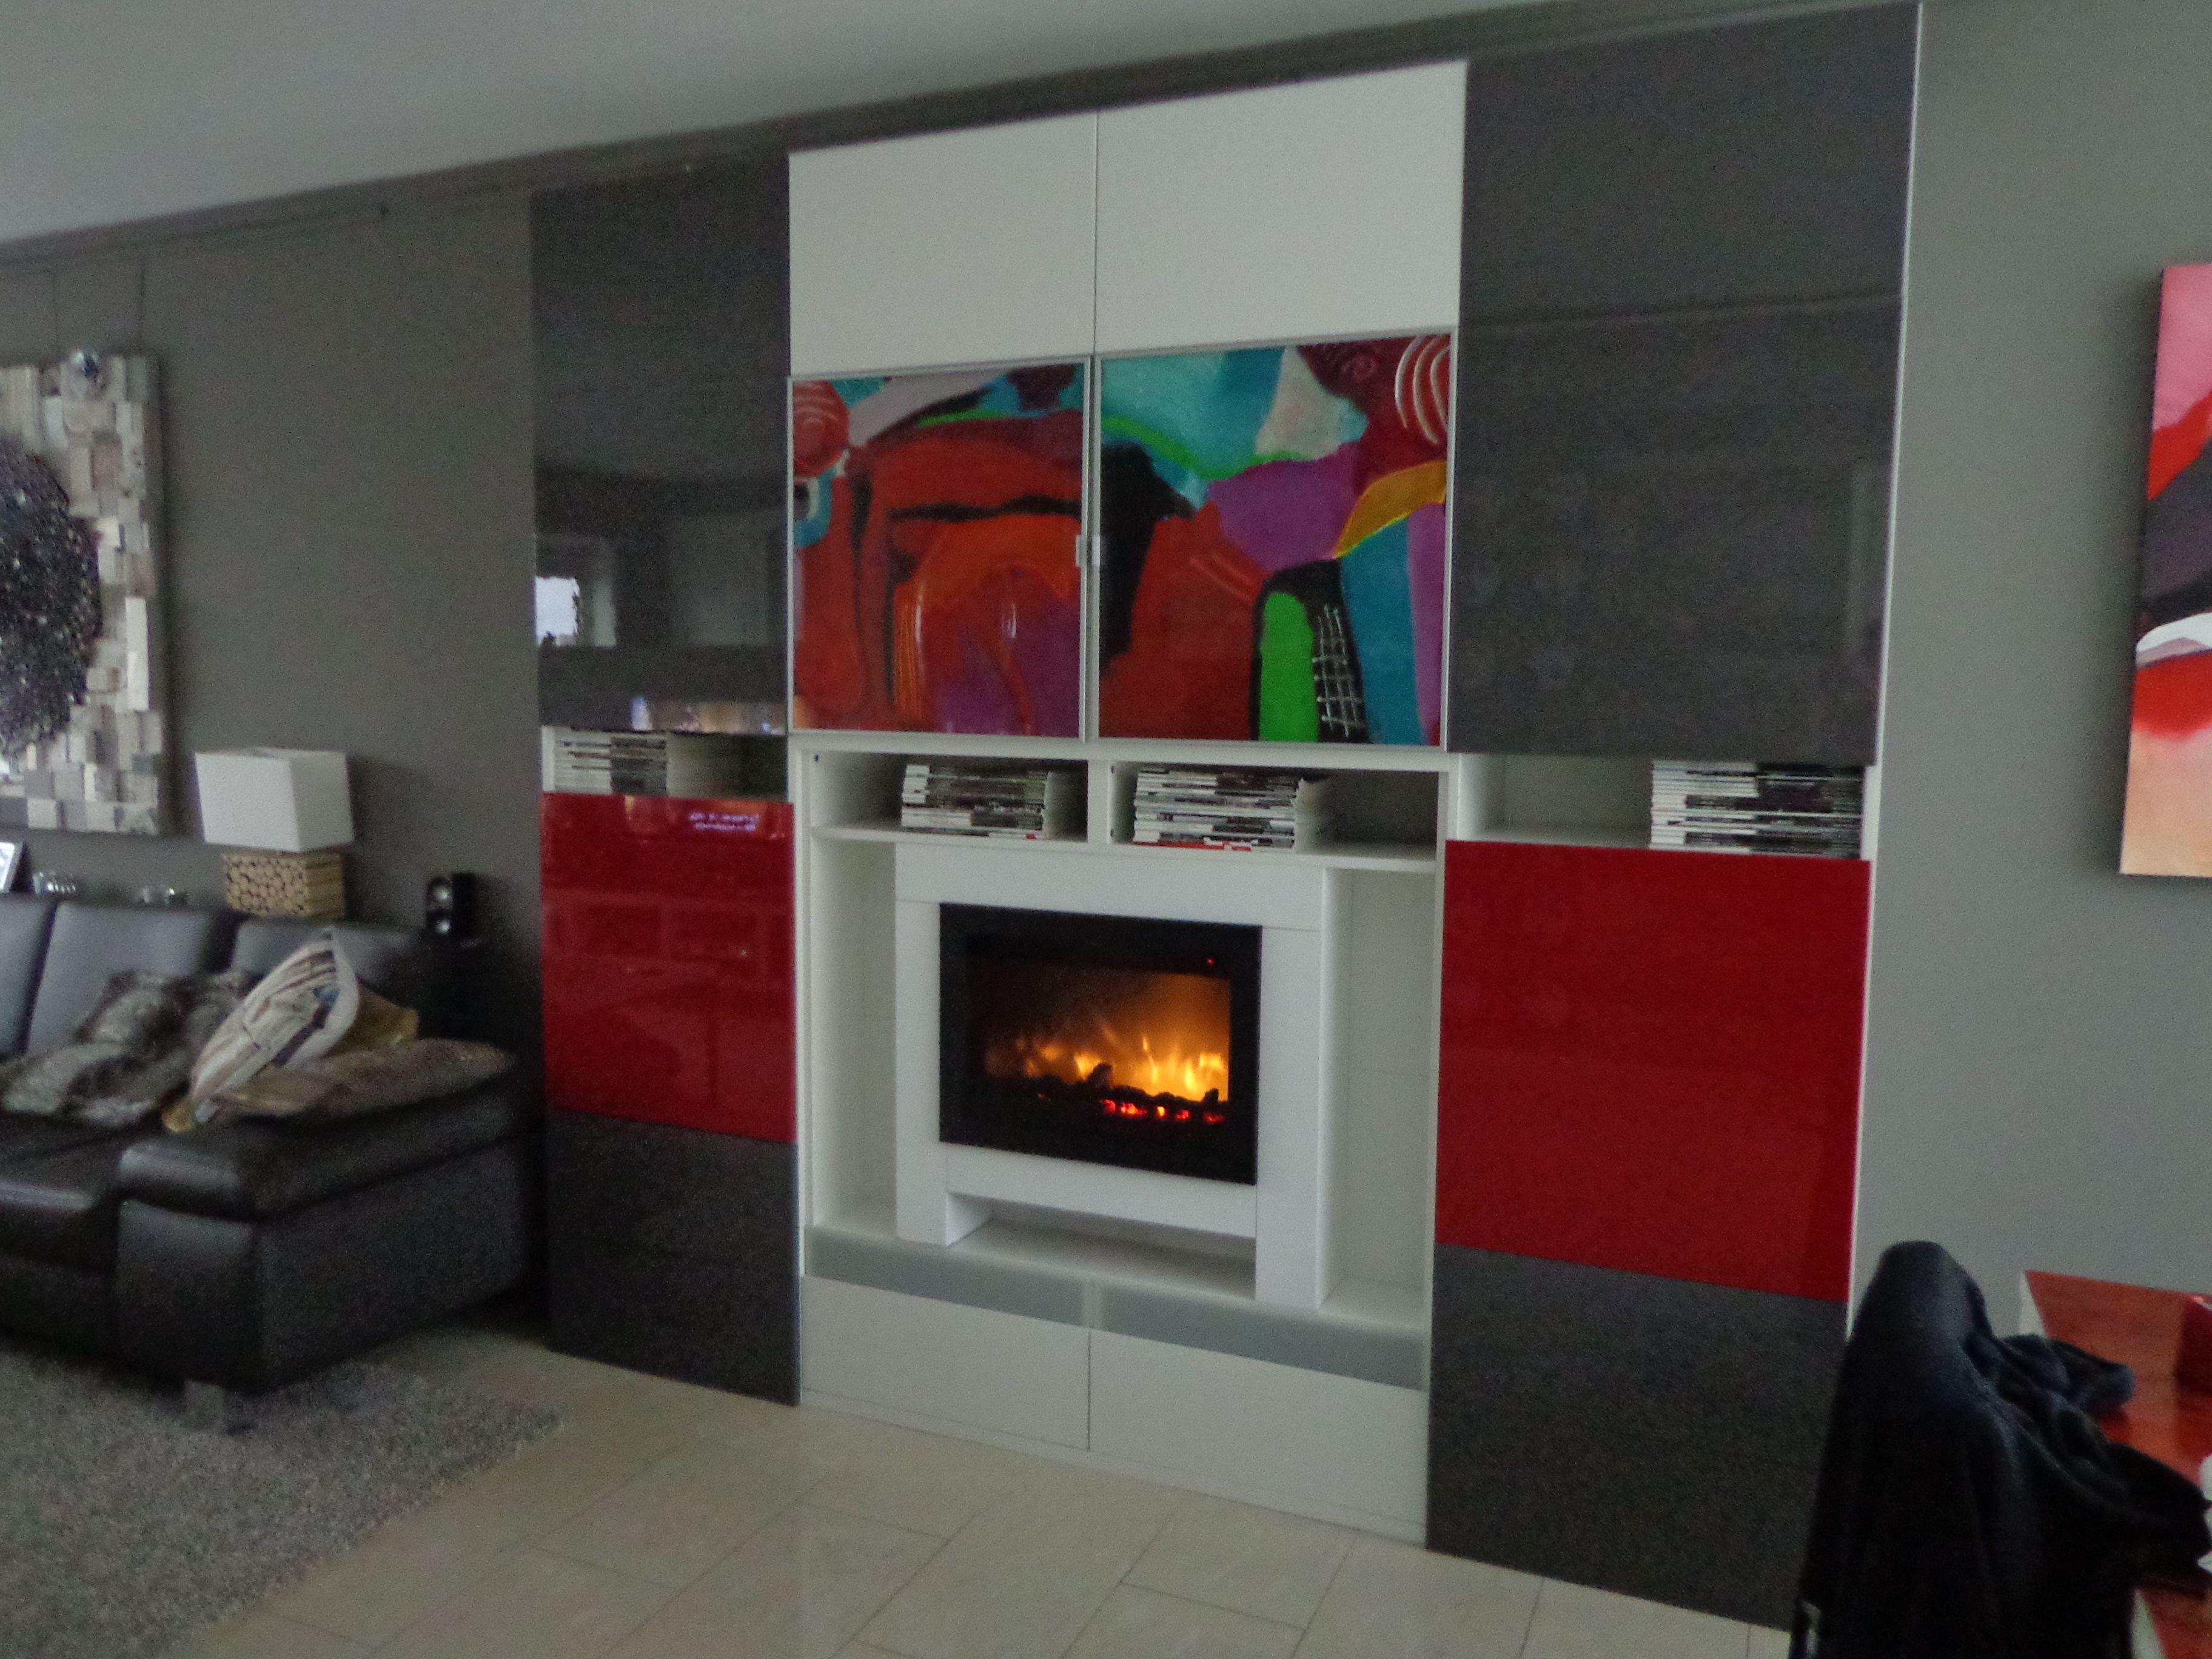 Ikea Red Credenza : Ikea besta my style dormitorio pinterest credenza buffet and